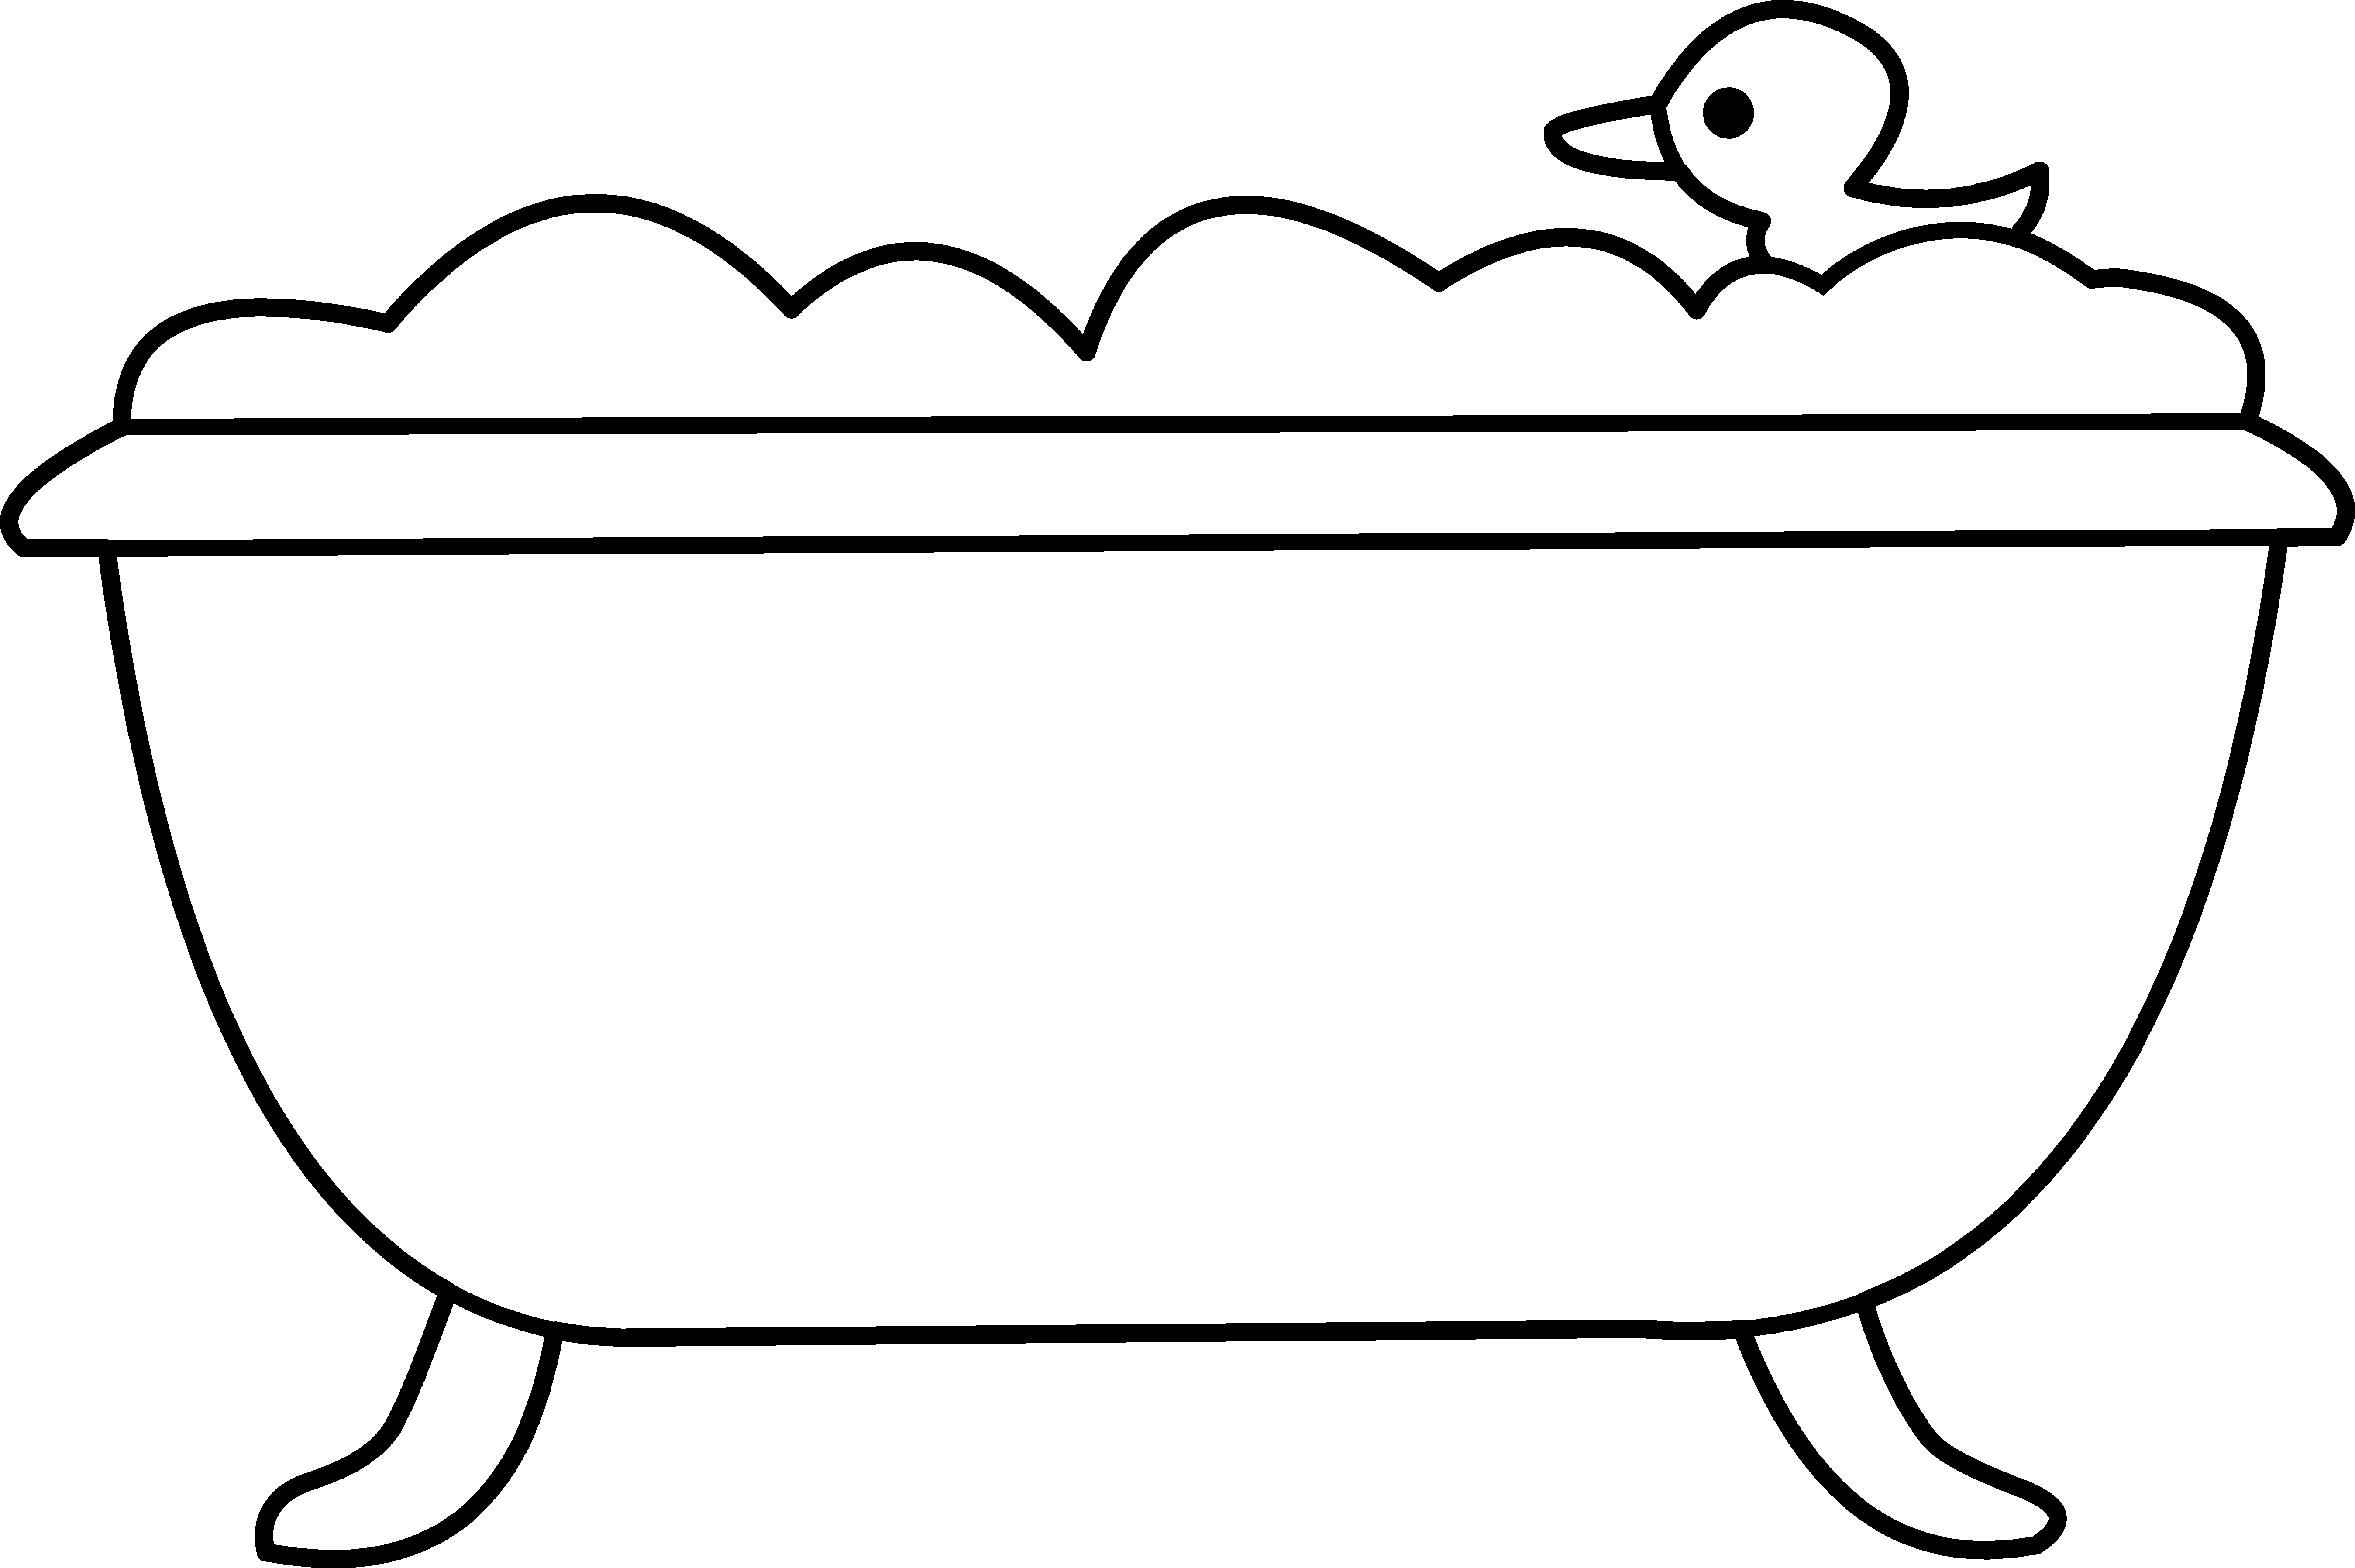 Cliparts bathtub download clip. Free printable dog bubble bath clipart silhouette